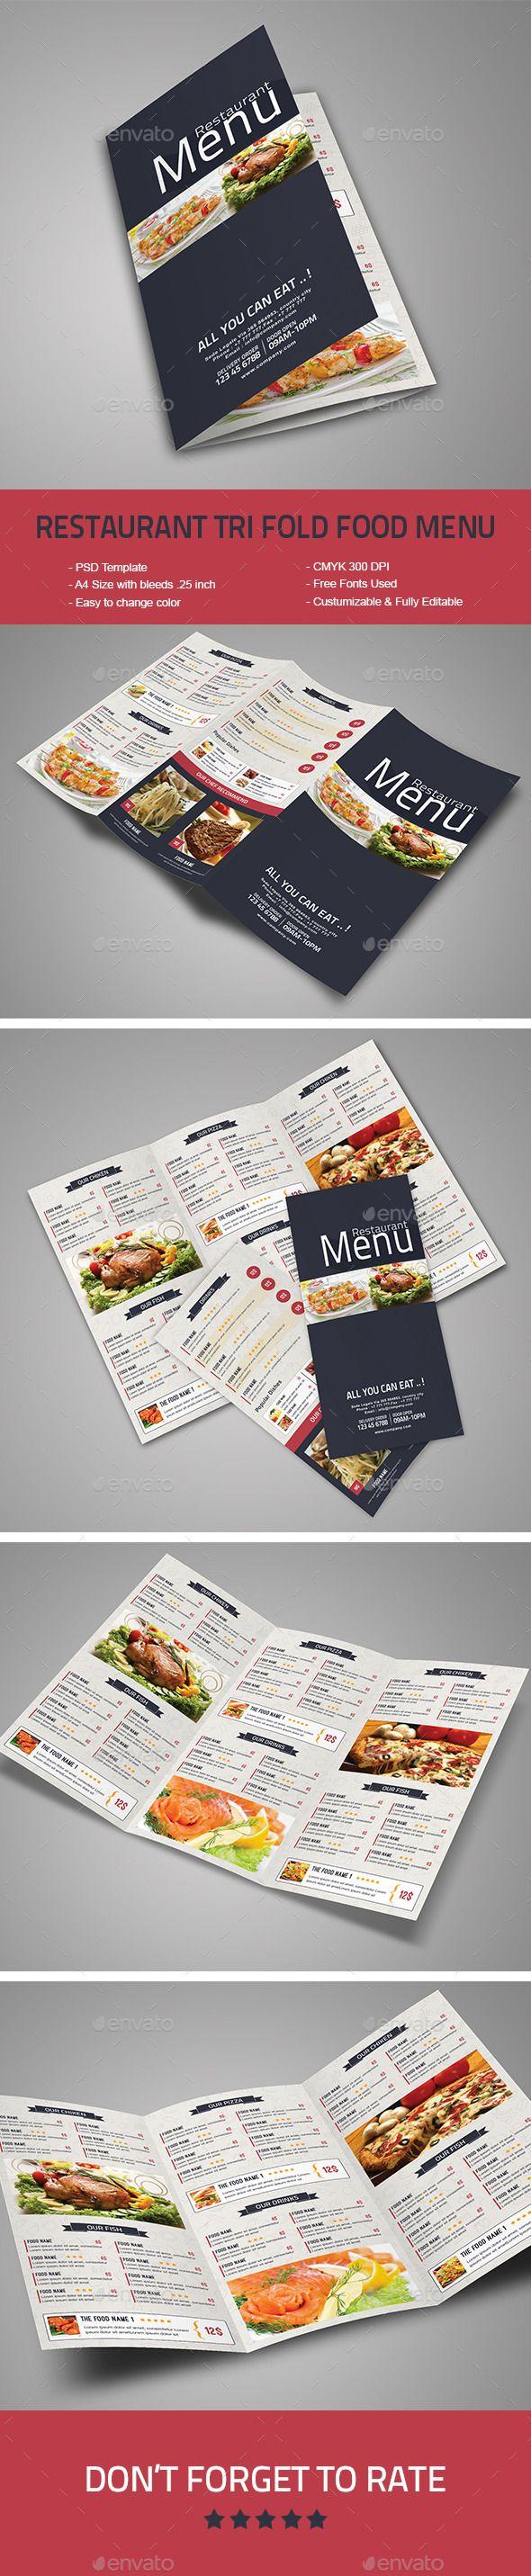 Restaurant Tri-Fold Food Menu Template #design Download: http://graphicriver.net/item/restaurant-trifold-food-menu/12110782?ref=ksioks